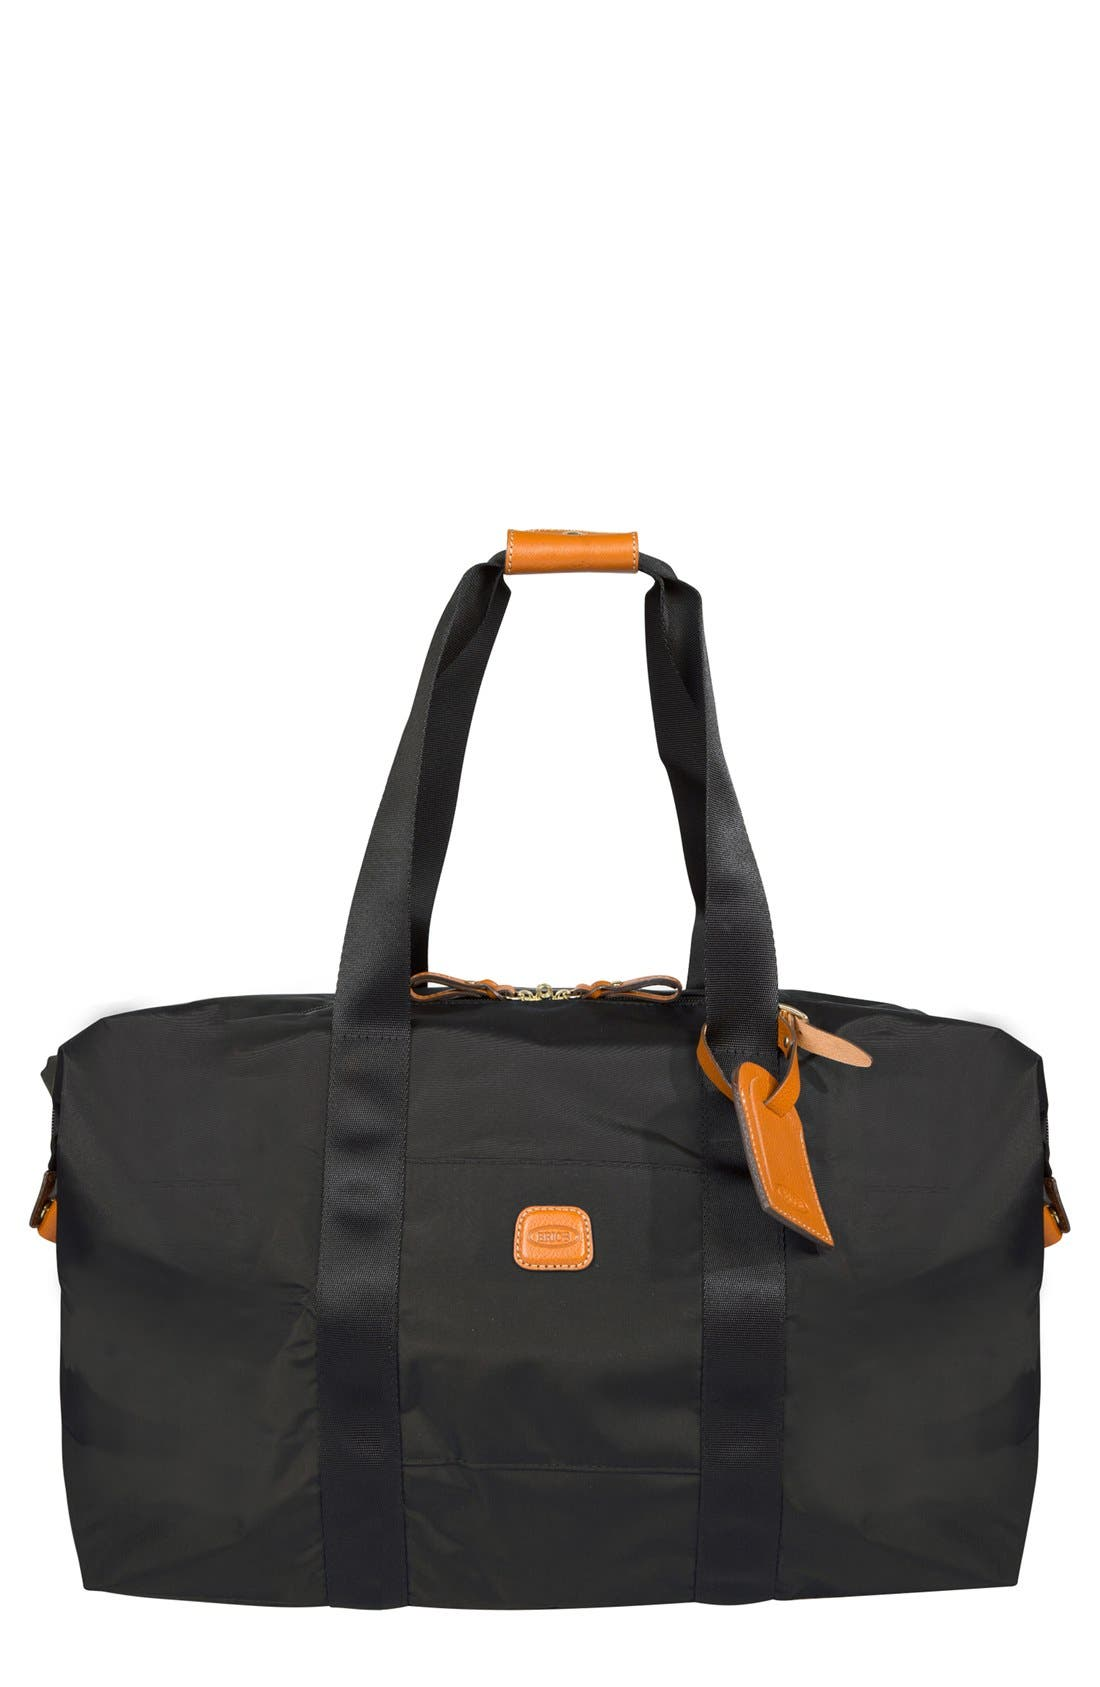 BRICS X-Bag 22-Inch Folding Duffel Bag